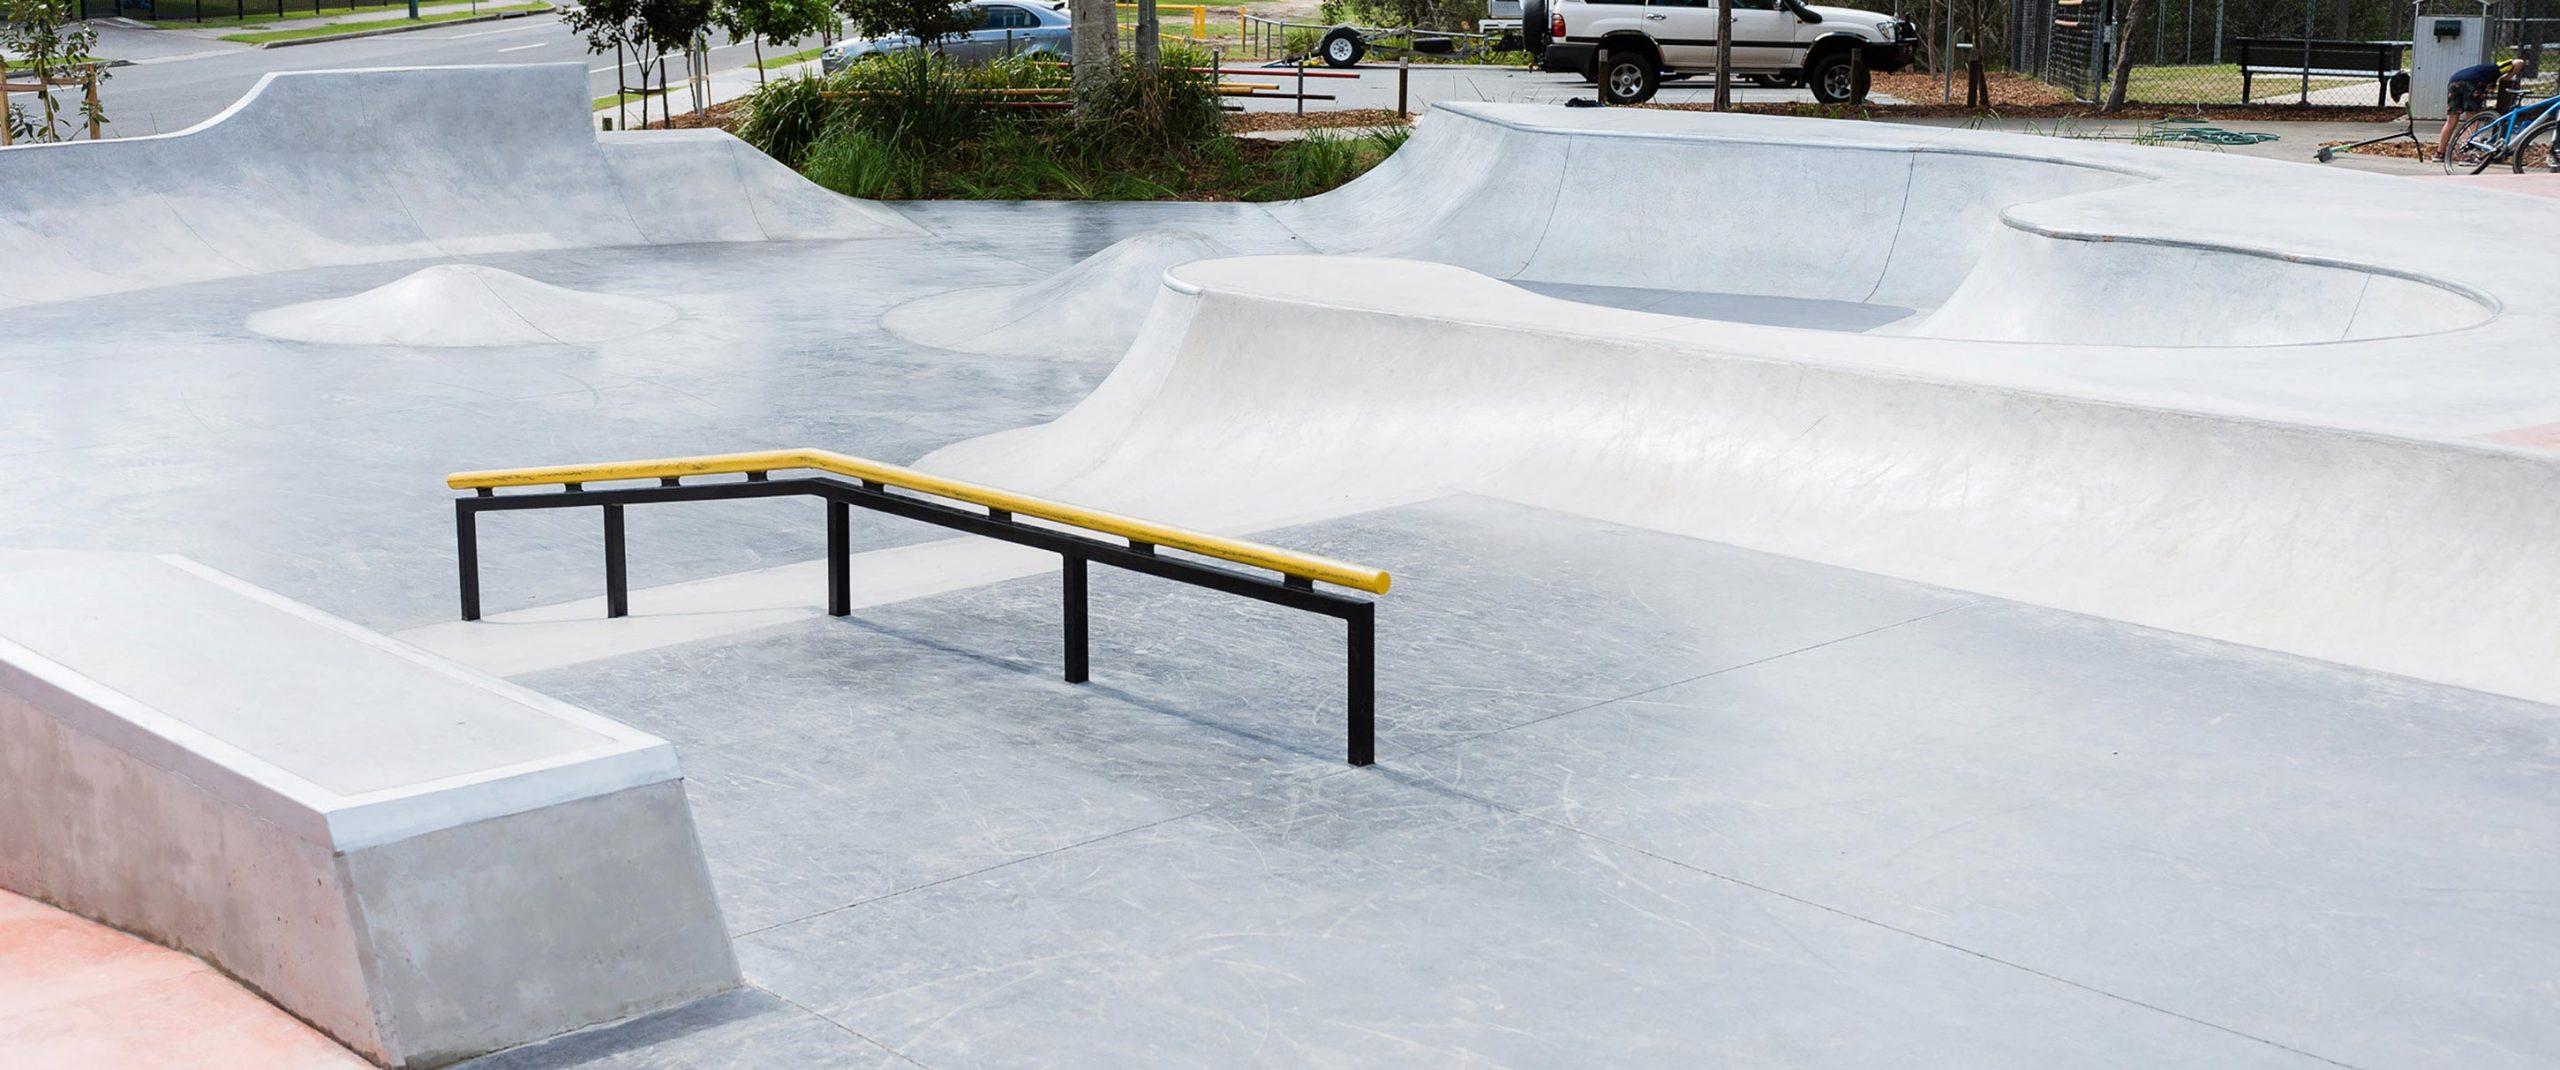 Narangba Skatepark